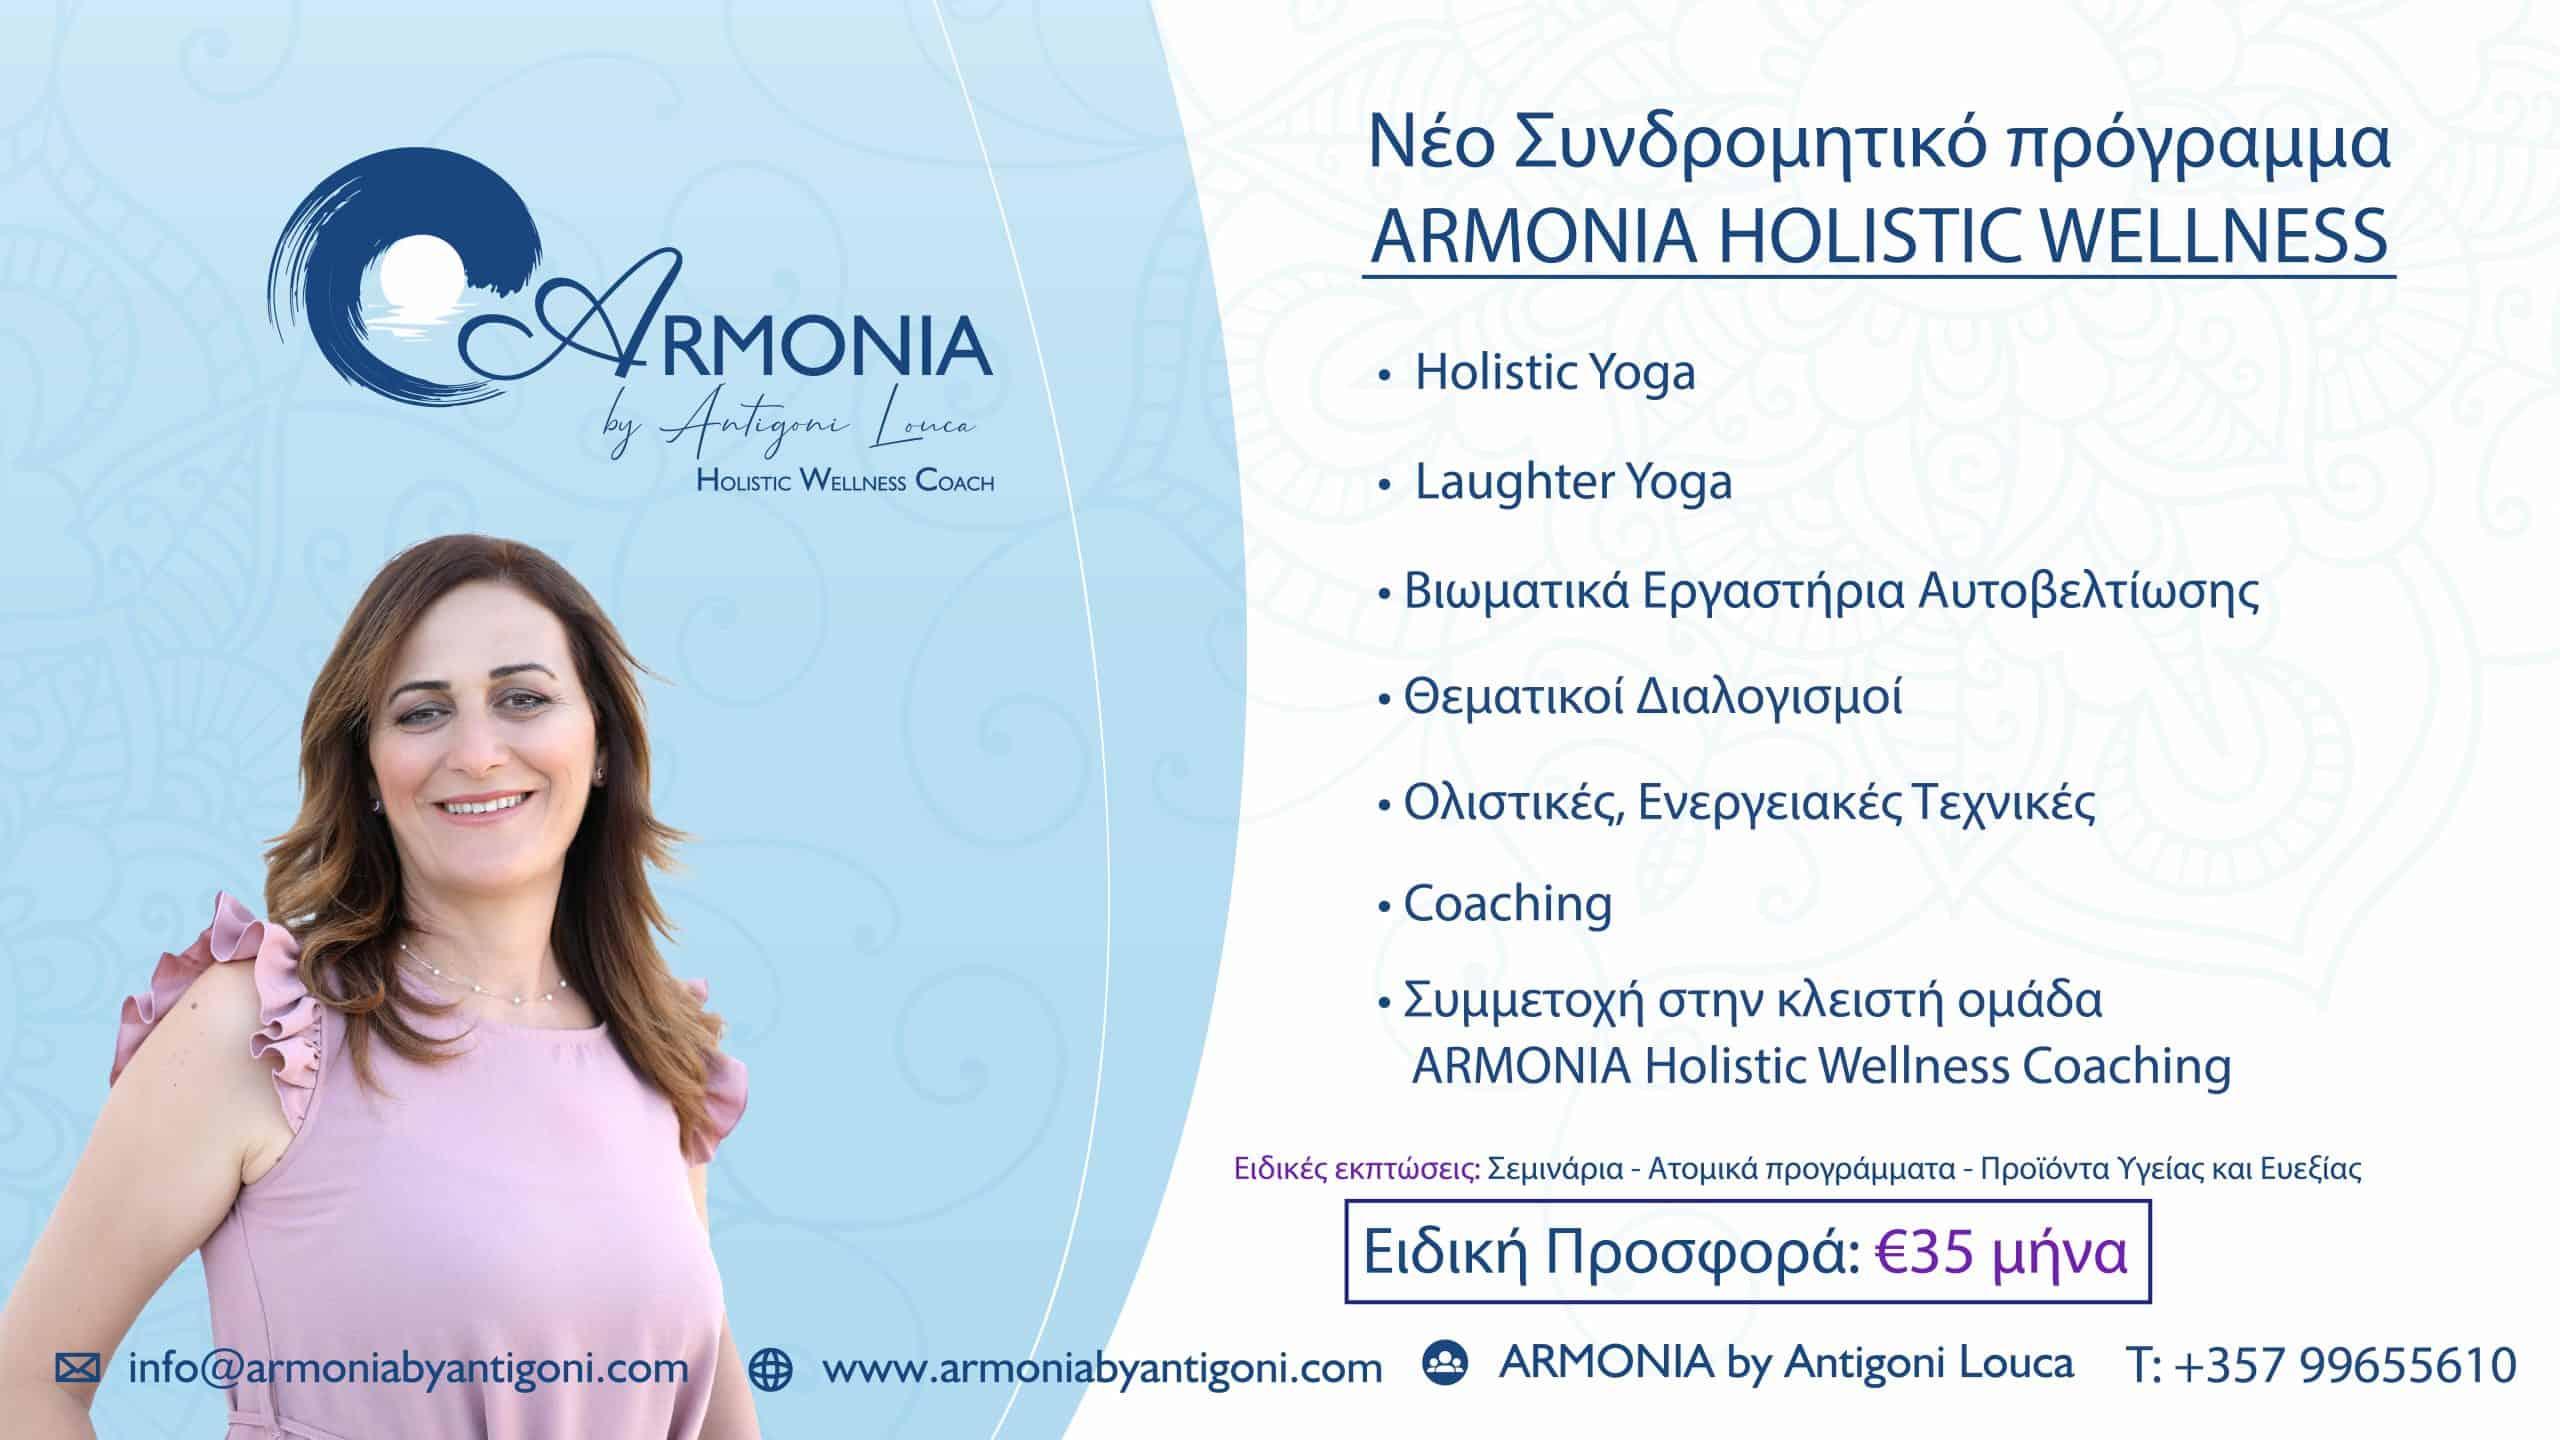 Armonia By Antigoni - Armonia Holistic Wellness / Annual subscription 4